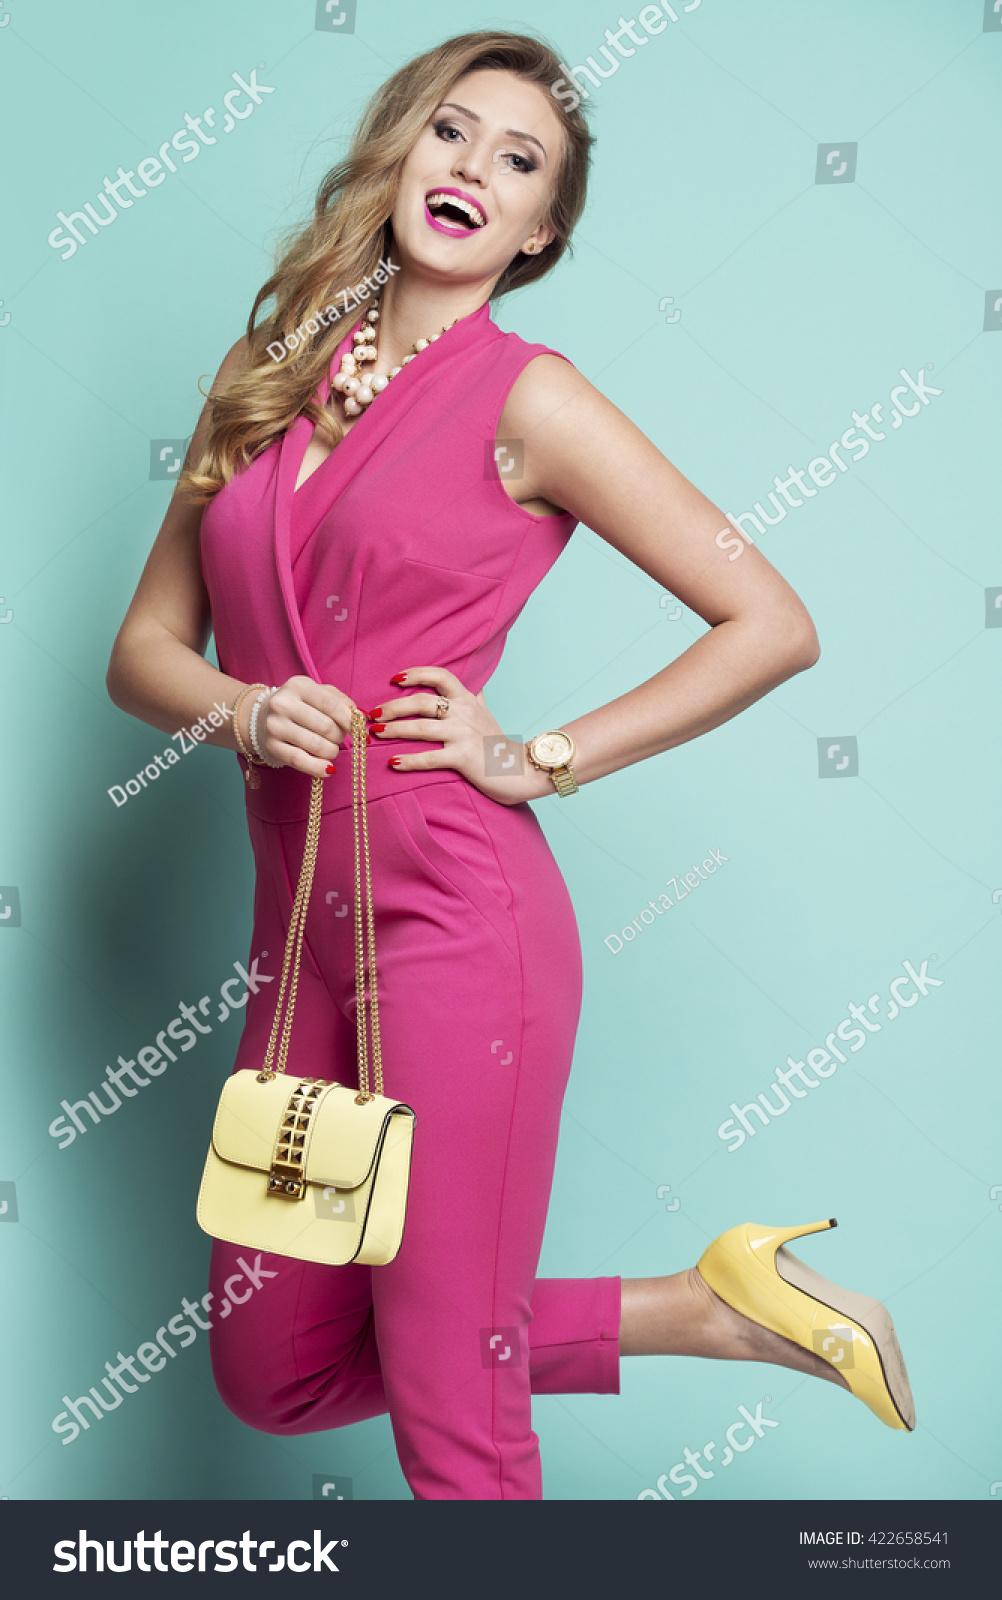 Happy Woman Pink Dress Yellow Bag Stock